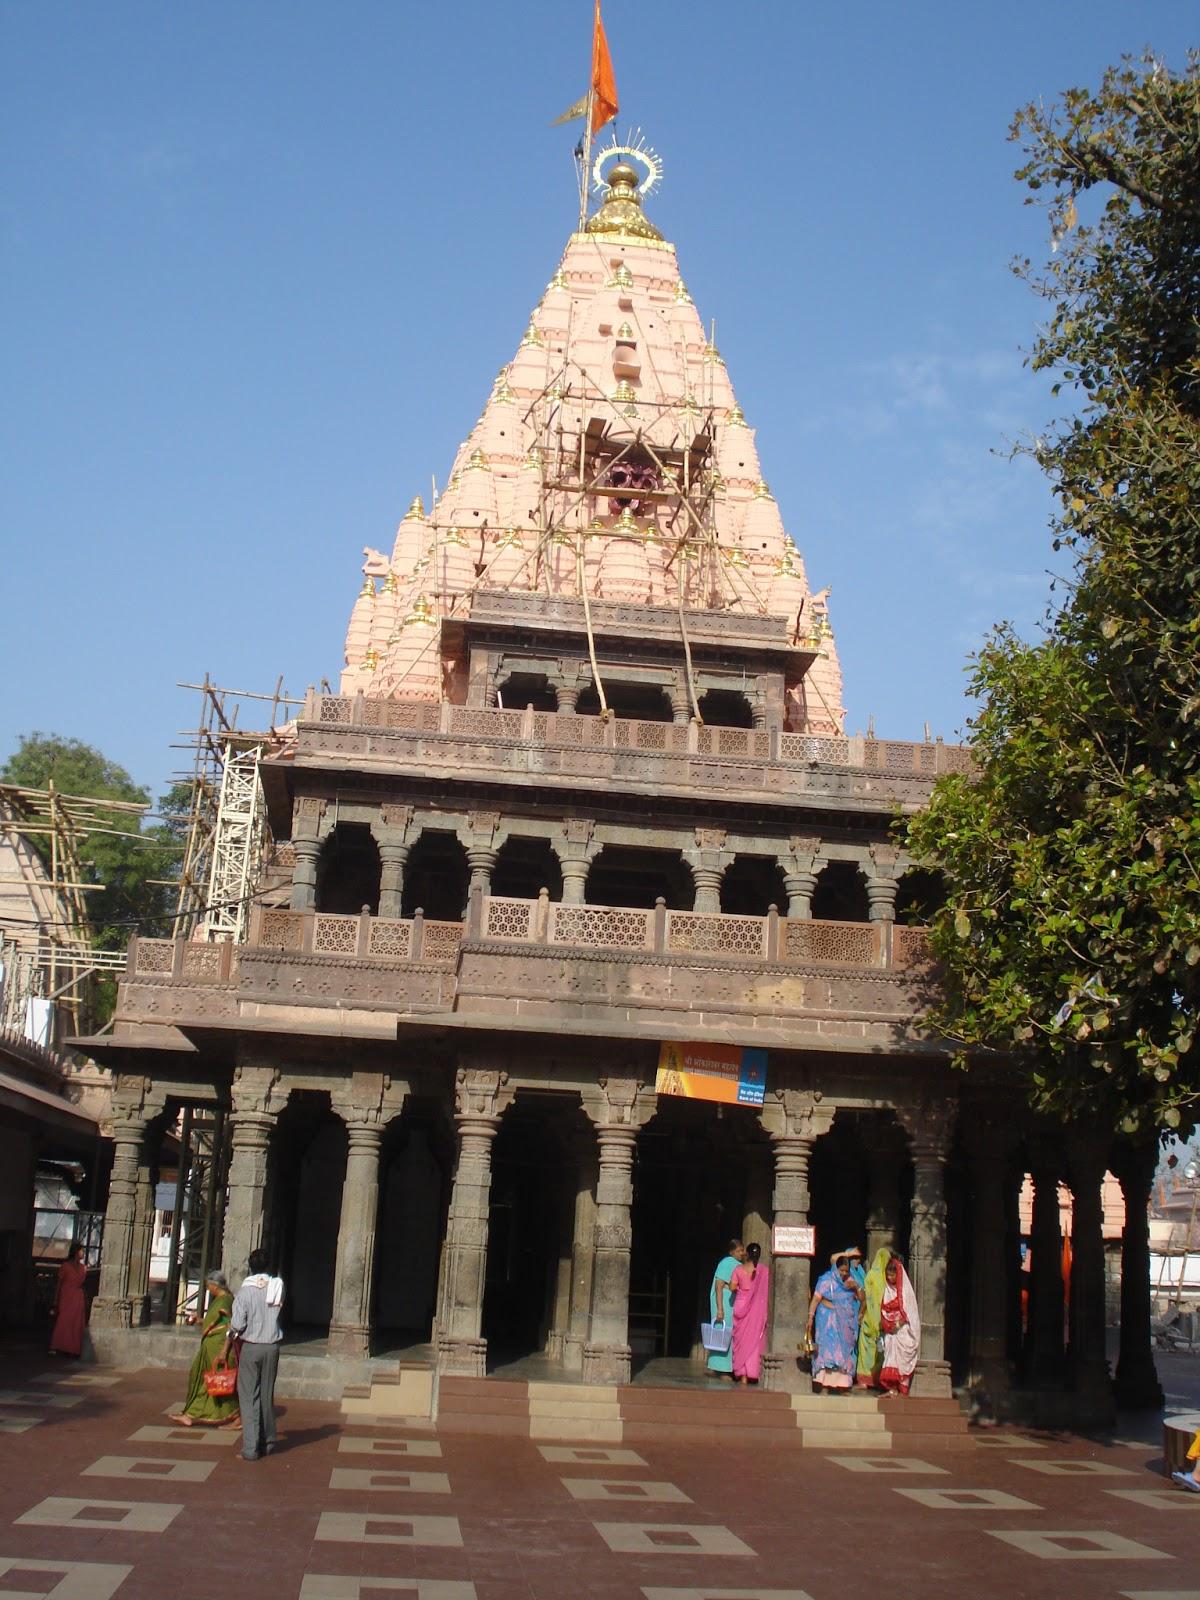 http://2.bp.blogspot.com/-IQDXq6VyG6E/UWuPUpqx5MI/AAAAAAAAAFg/LOtMWFvJOIw/s1600/Mahakal_Temple_Ujjain.JPG